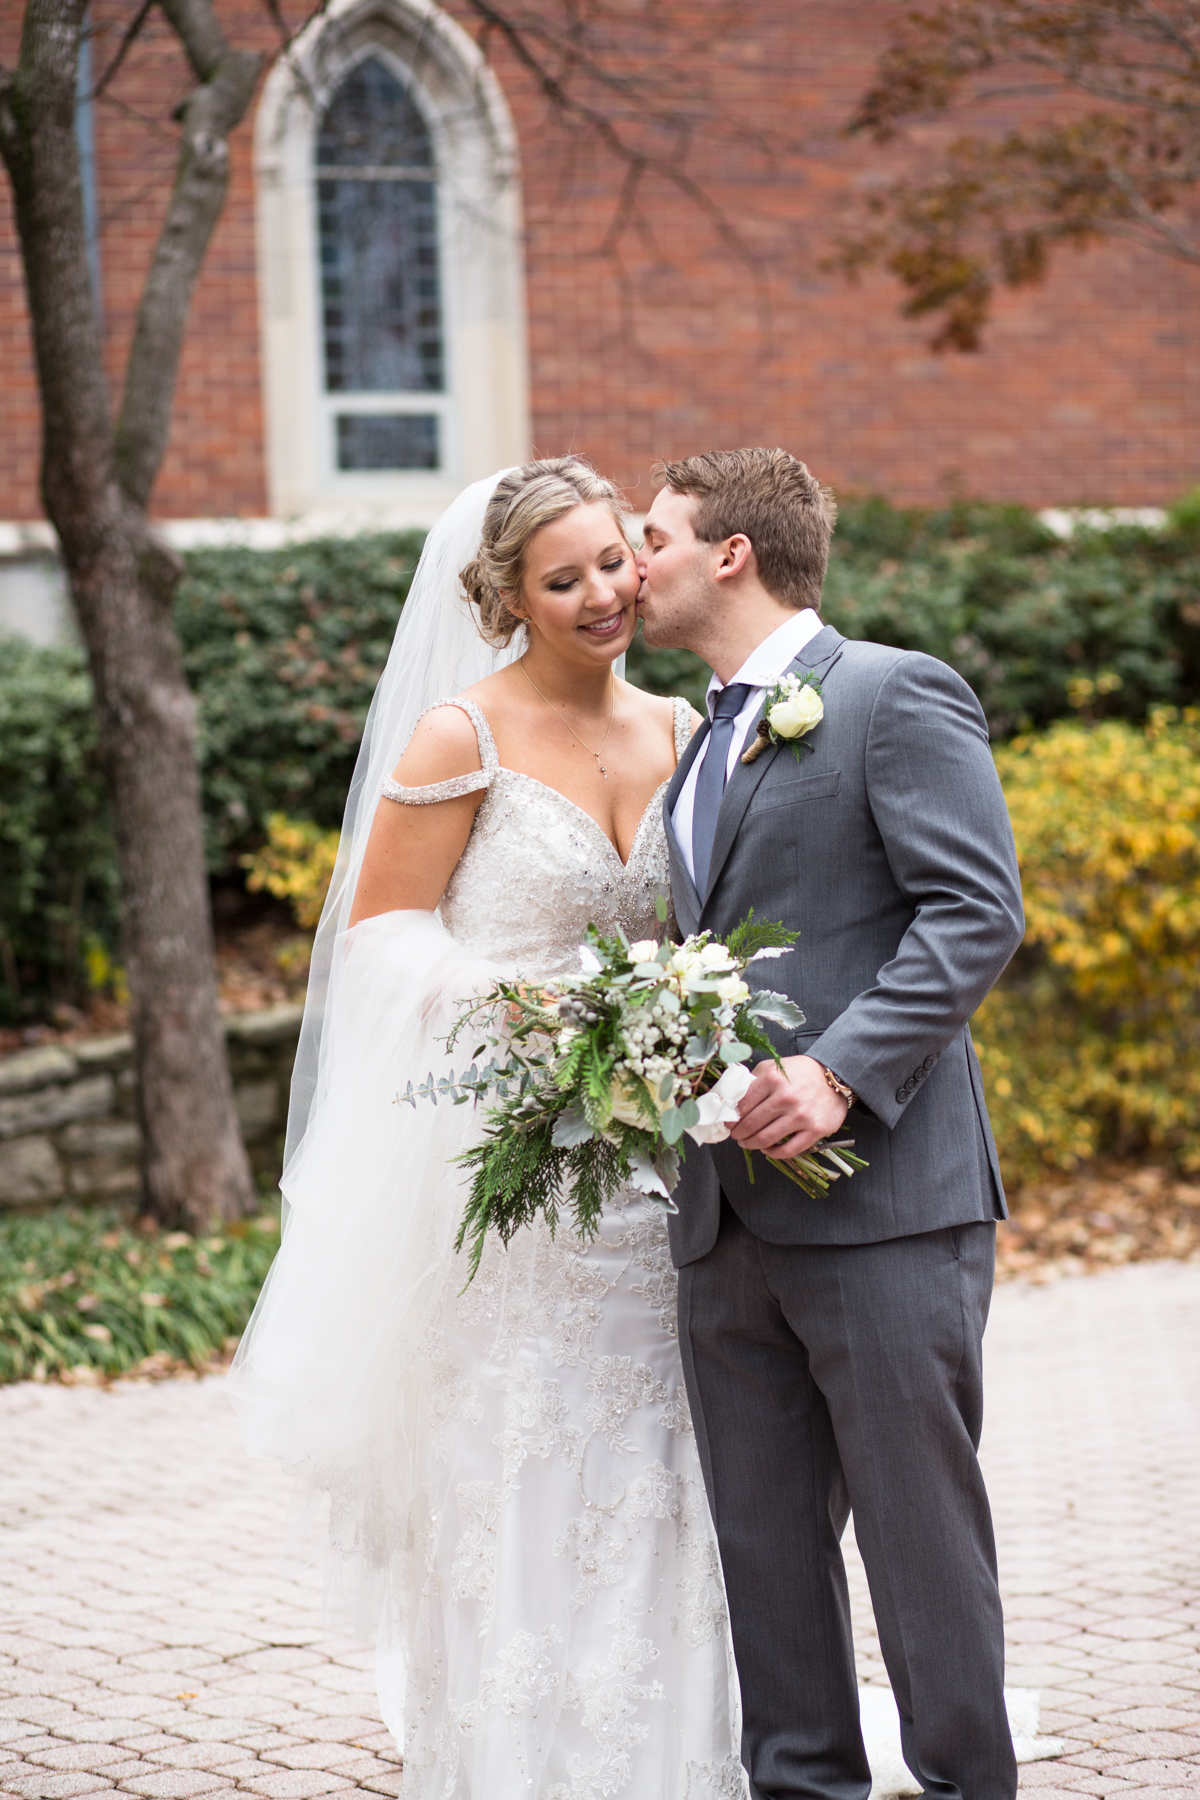 Kelli-and-Matt-Nashville-Wedding-Sneak-Peak-0136.jpg